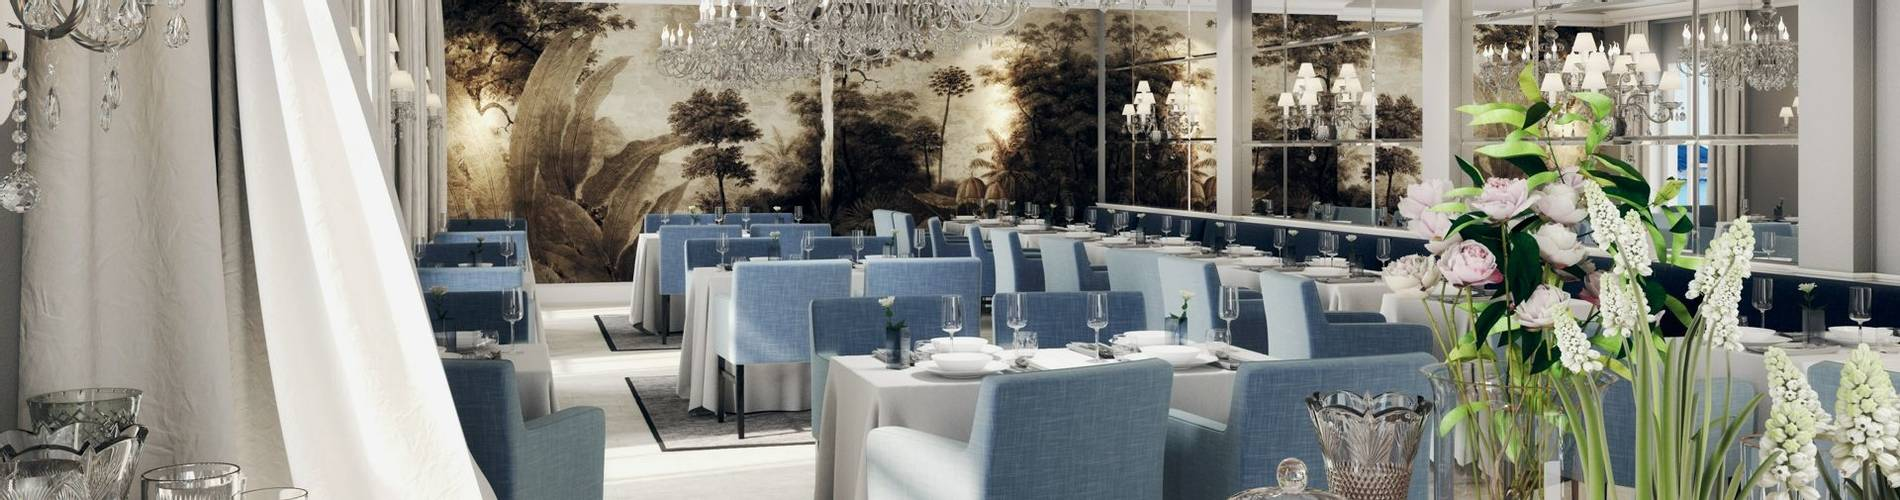 PalaceRestaurant1.jpg